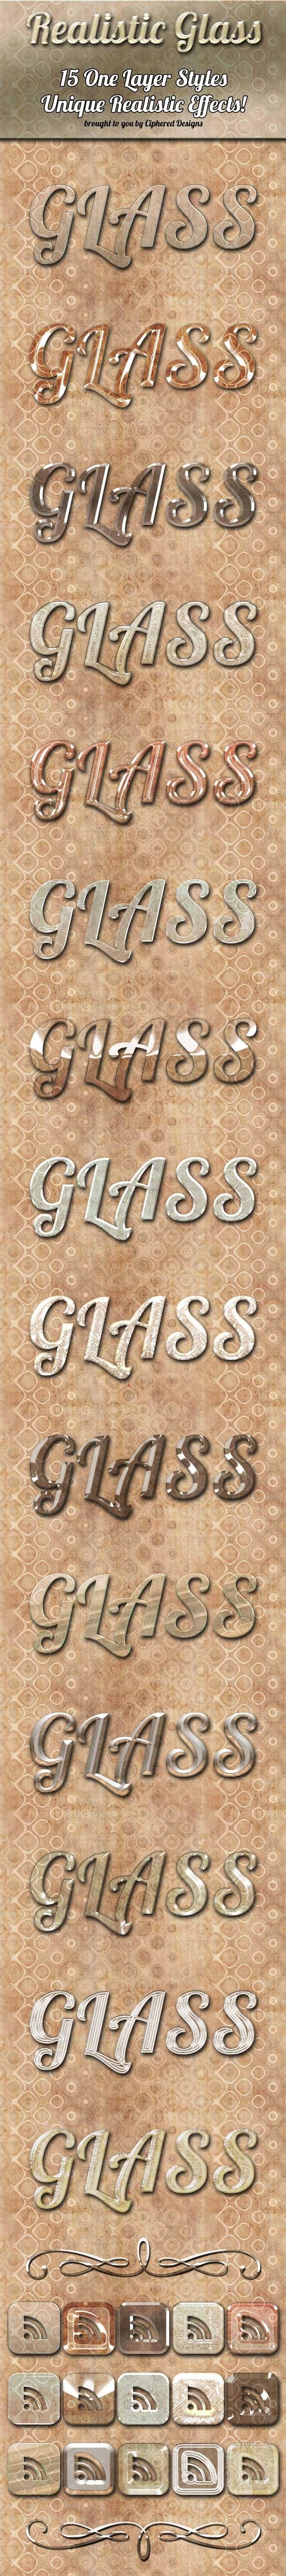 Realistic Glass - Photoshop Styles